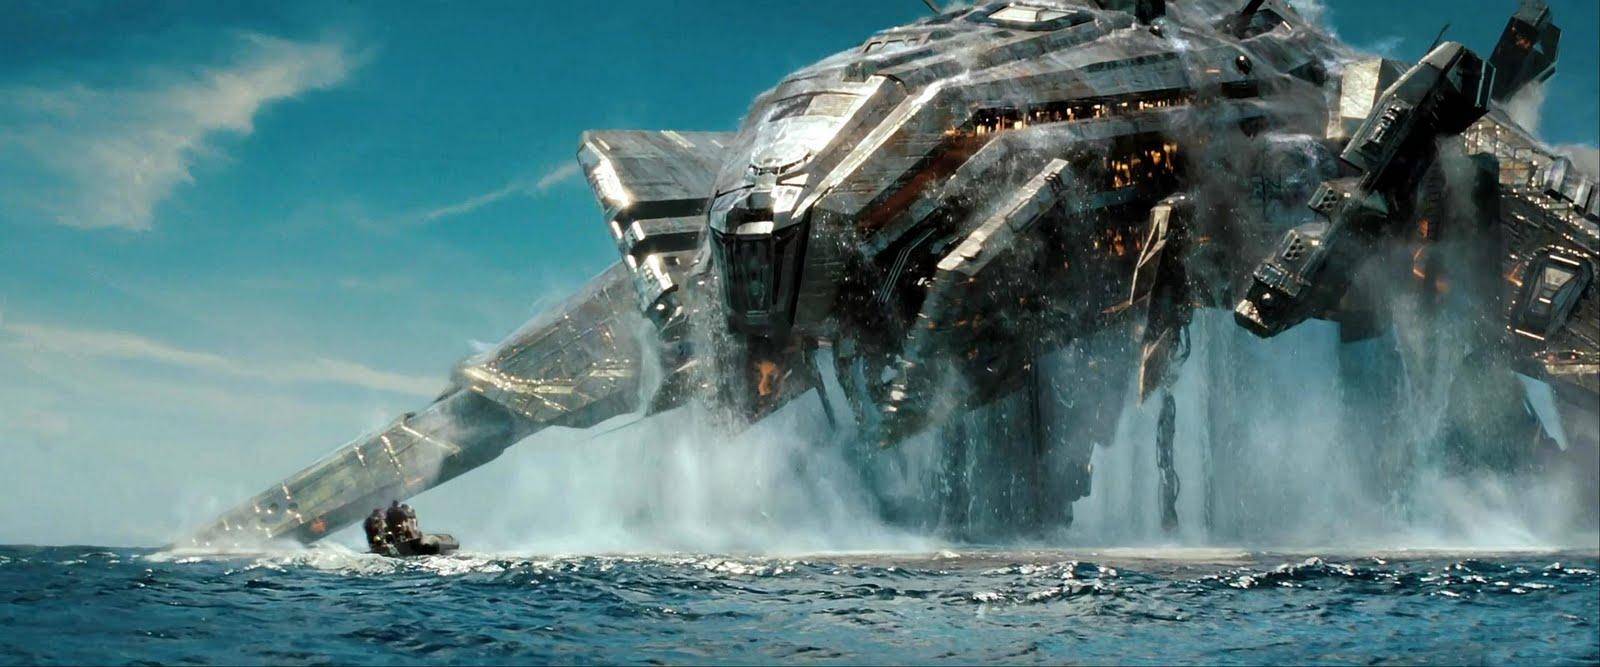 (Scene in Film Battleship)